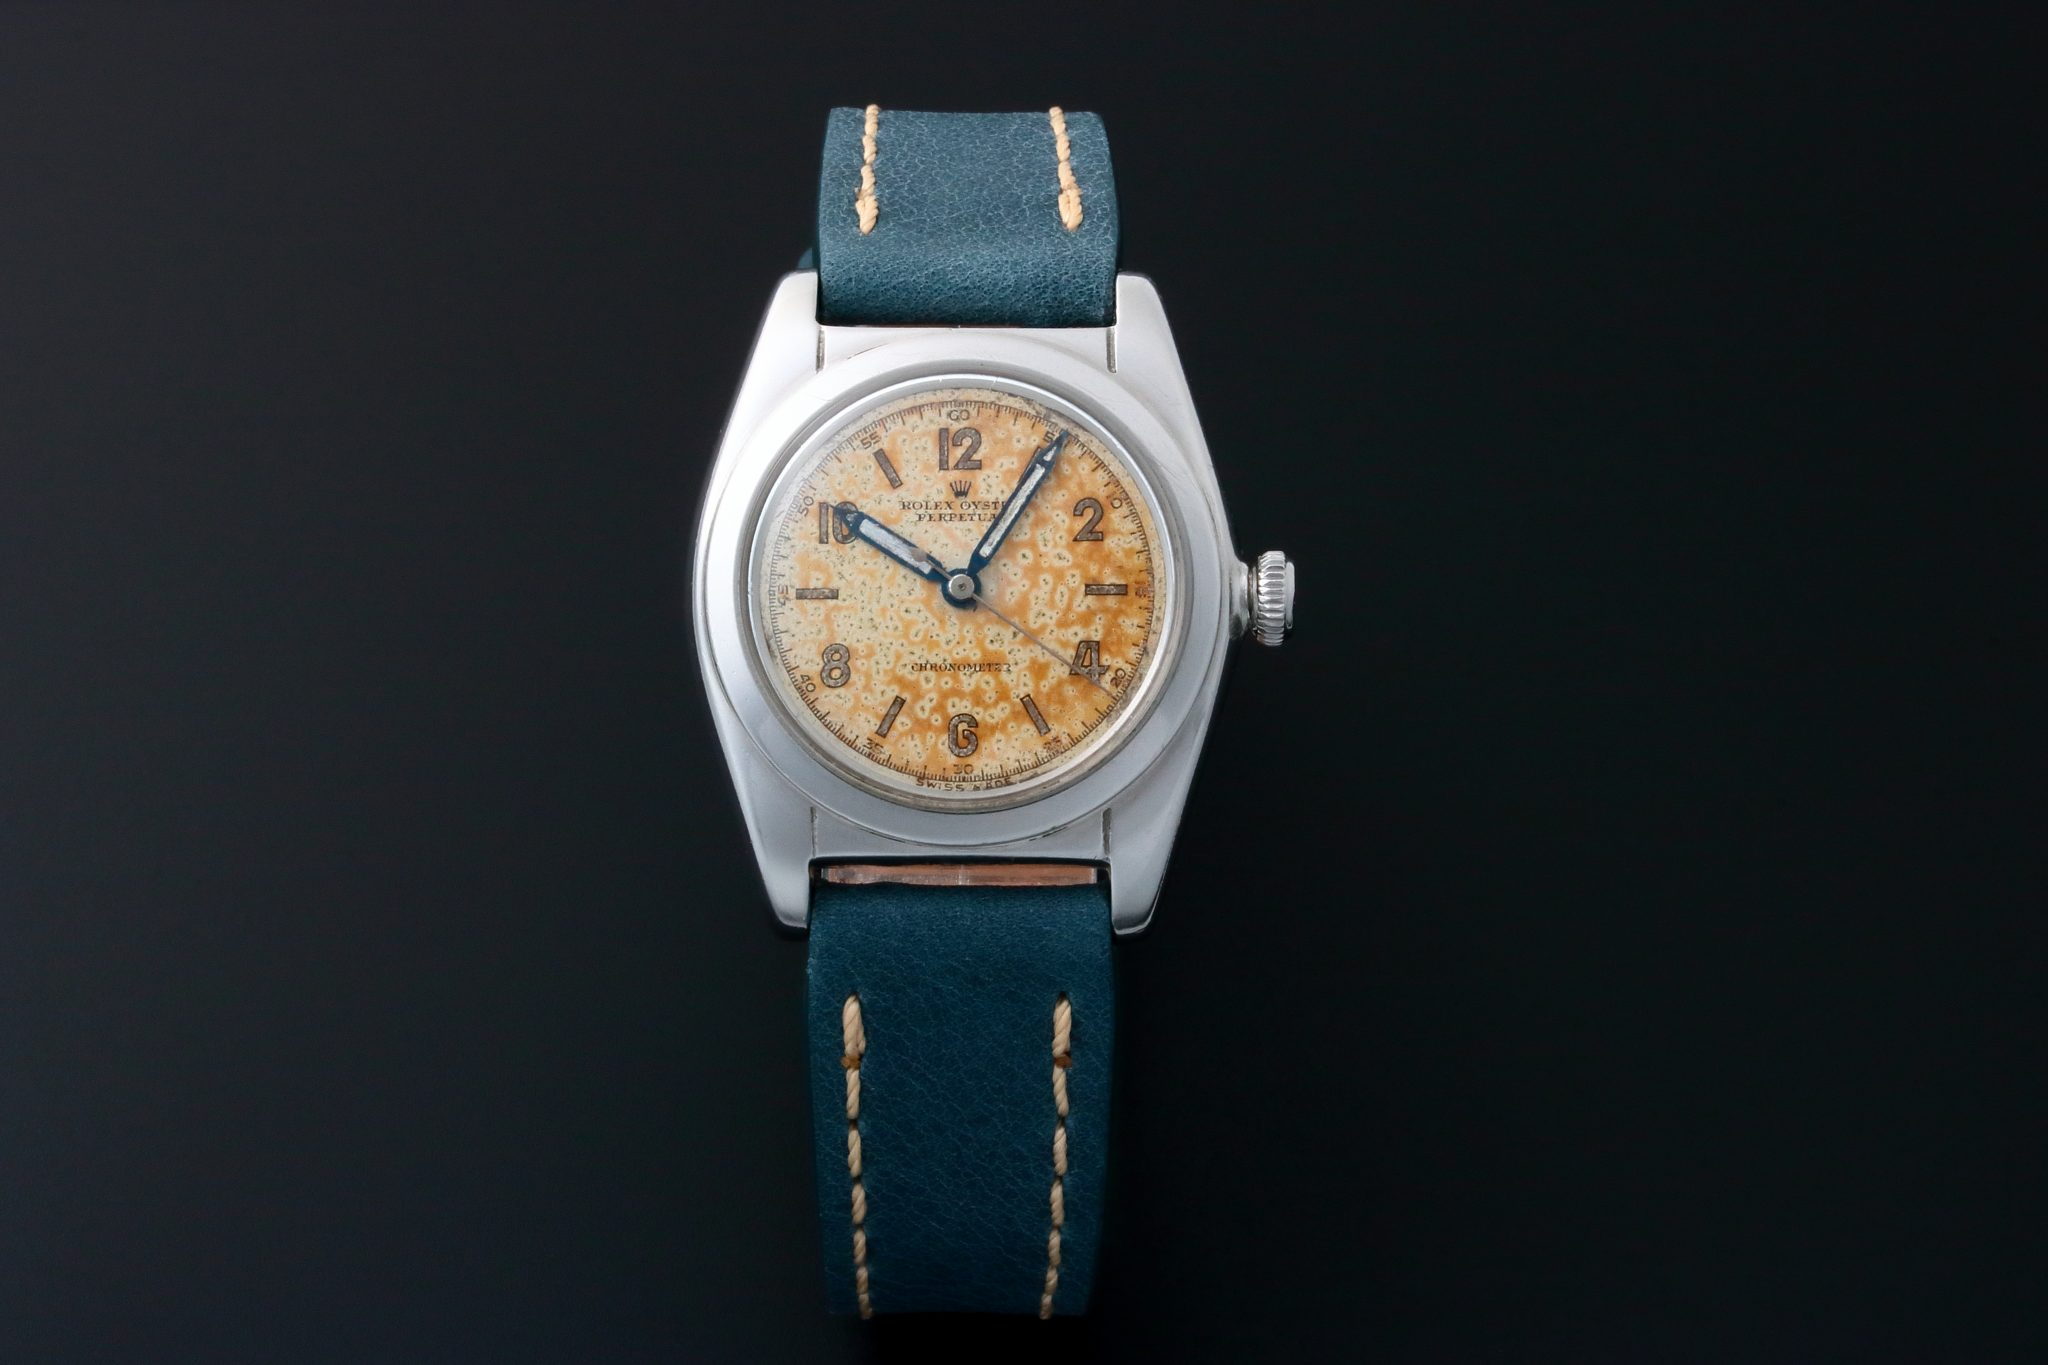 Lot 3208 , Rolex Bubbleback Chronometer Watch 2940 ⋆ Watch